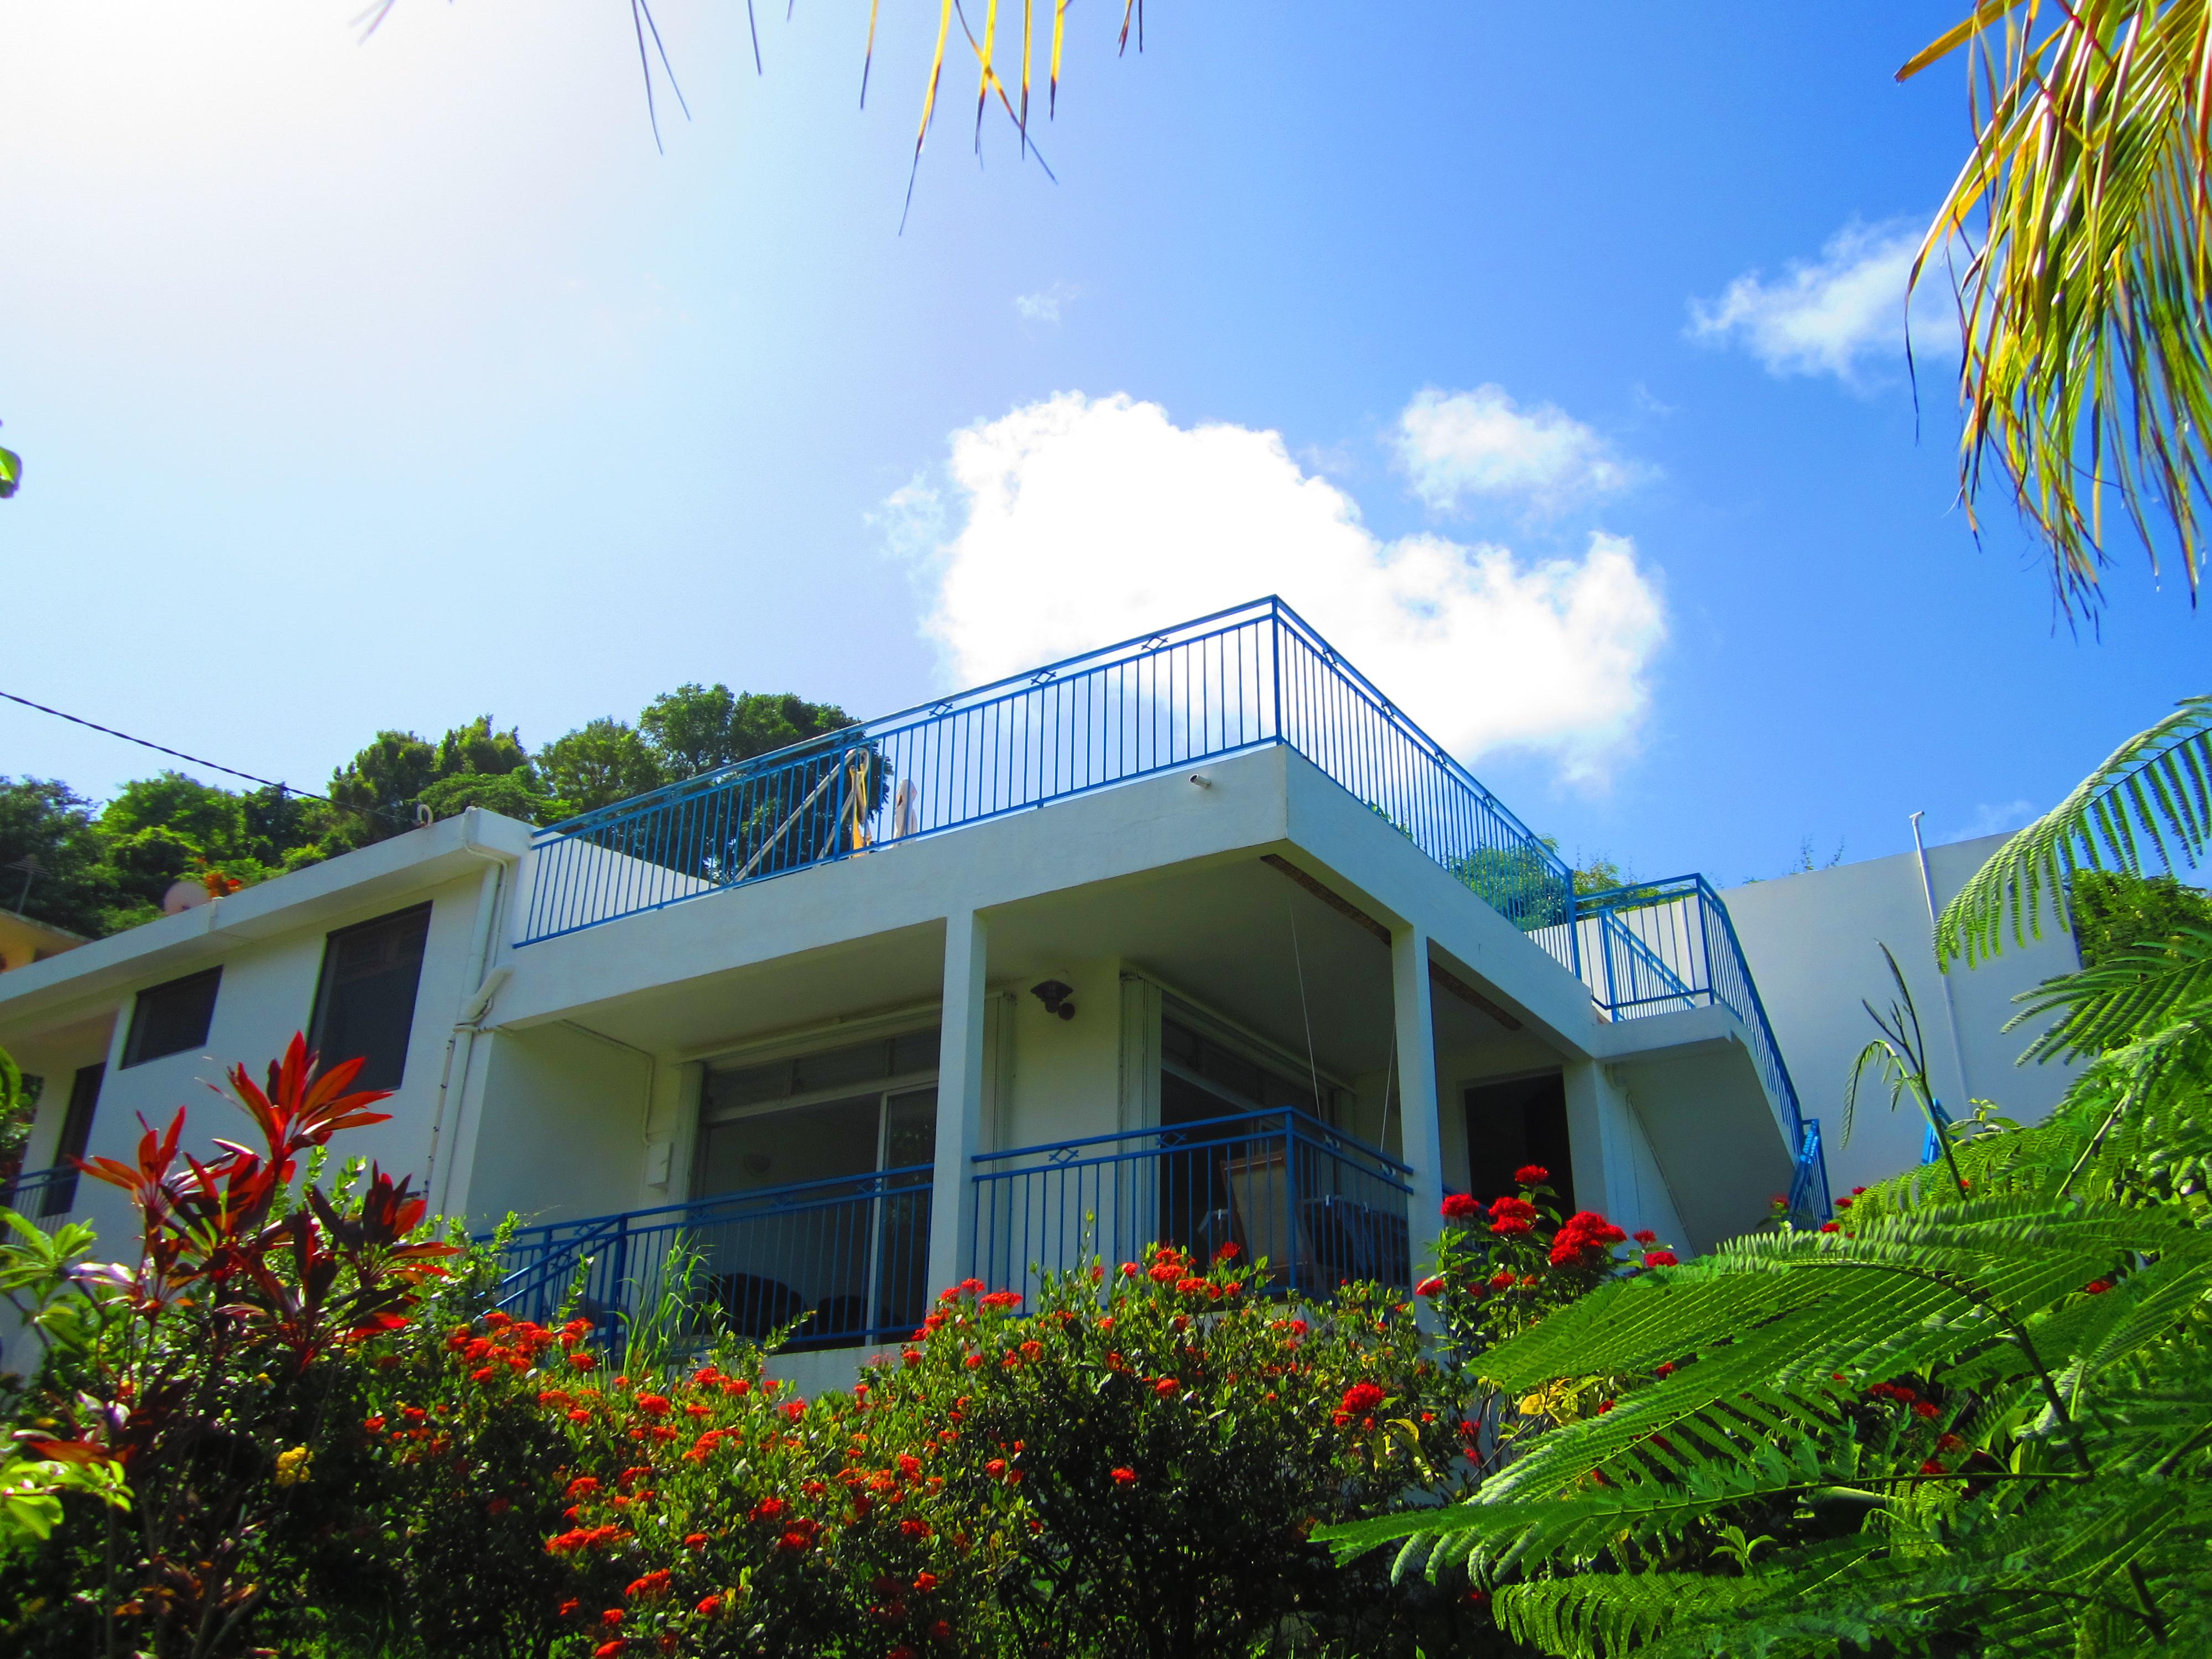 villa le paradis sainte anne bourg villa le paradis sainte anne bourg villa le paradis. Black Bedroom Furniture Sets. Home Design Ideas